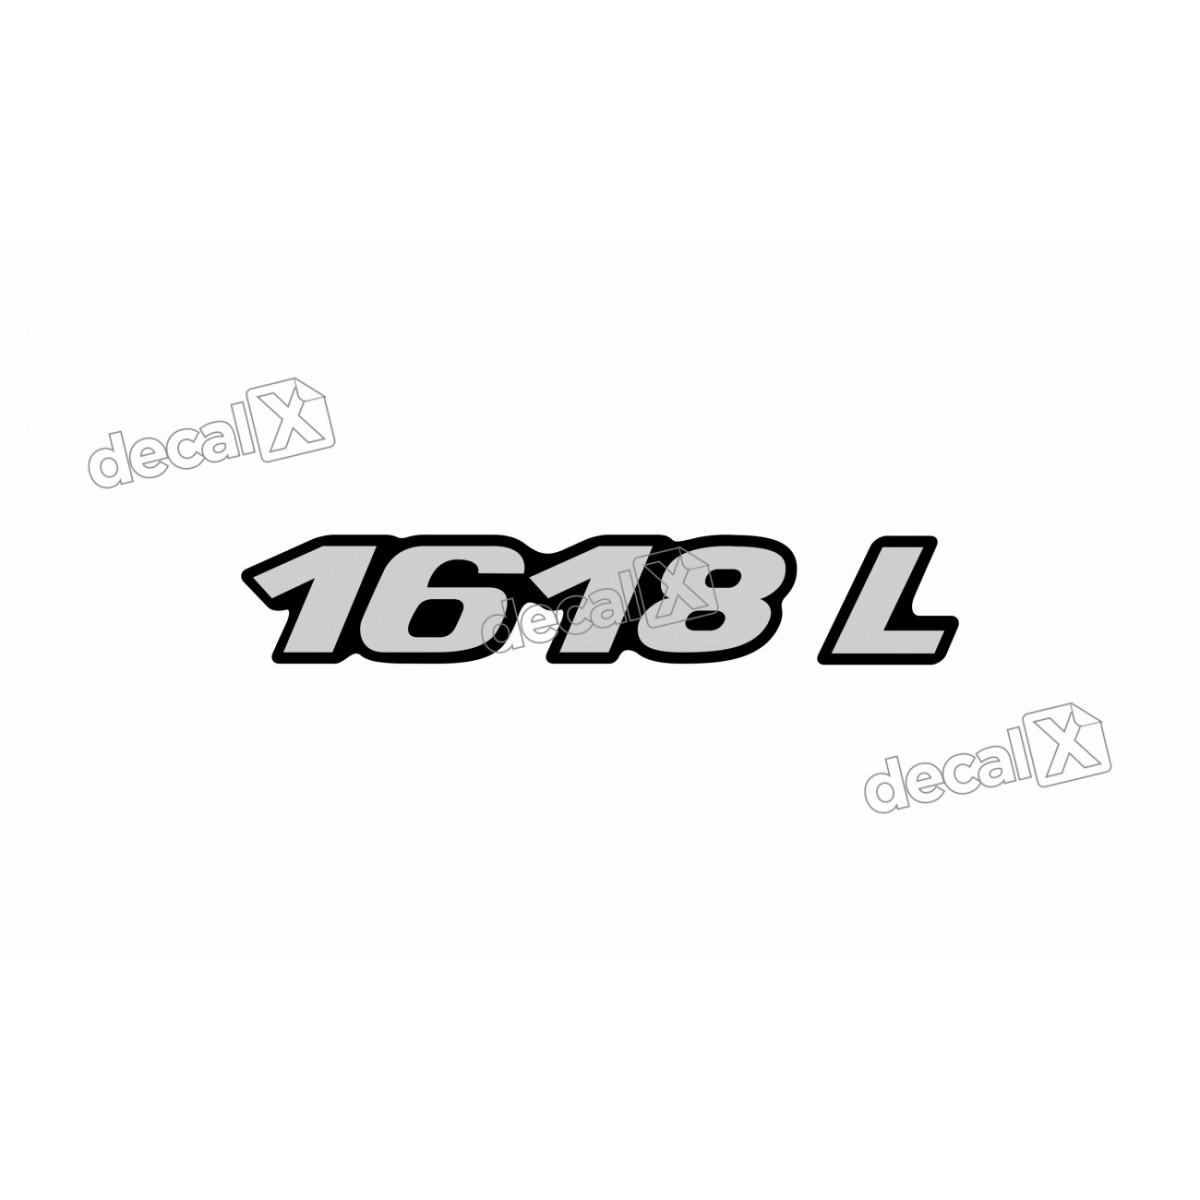 Adesivo Emblema Resinado Mercedes 1618 L Cm43 Decalx